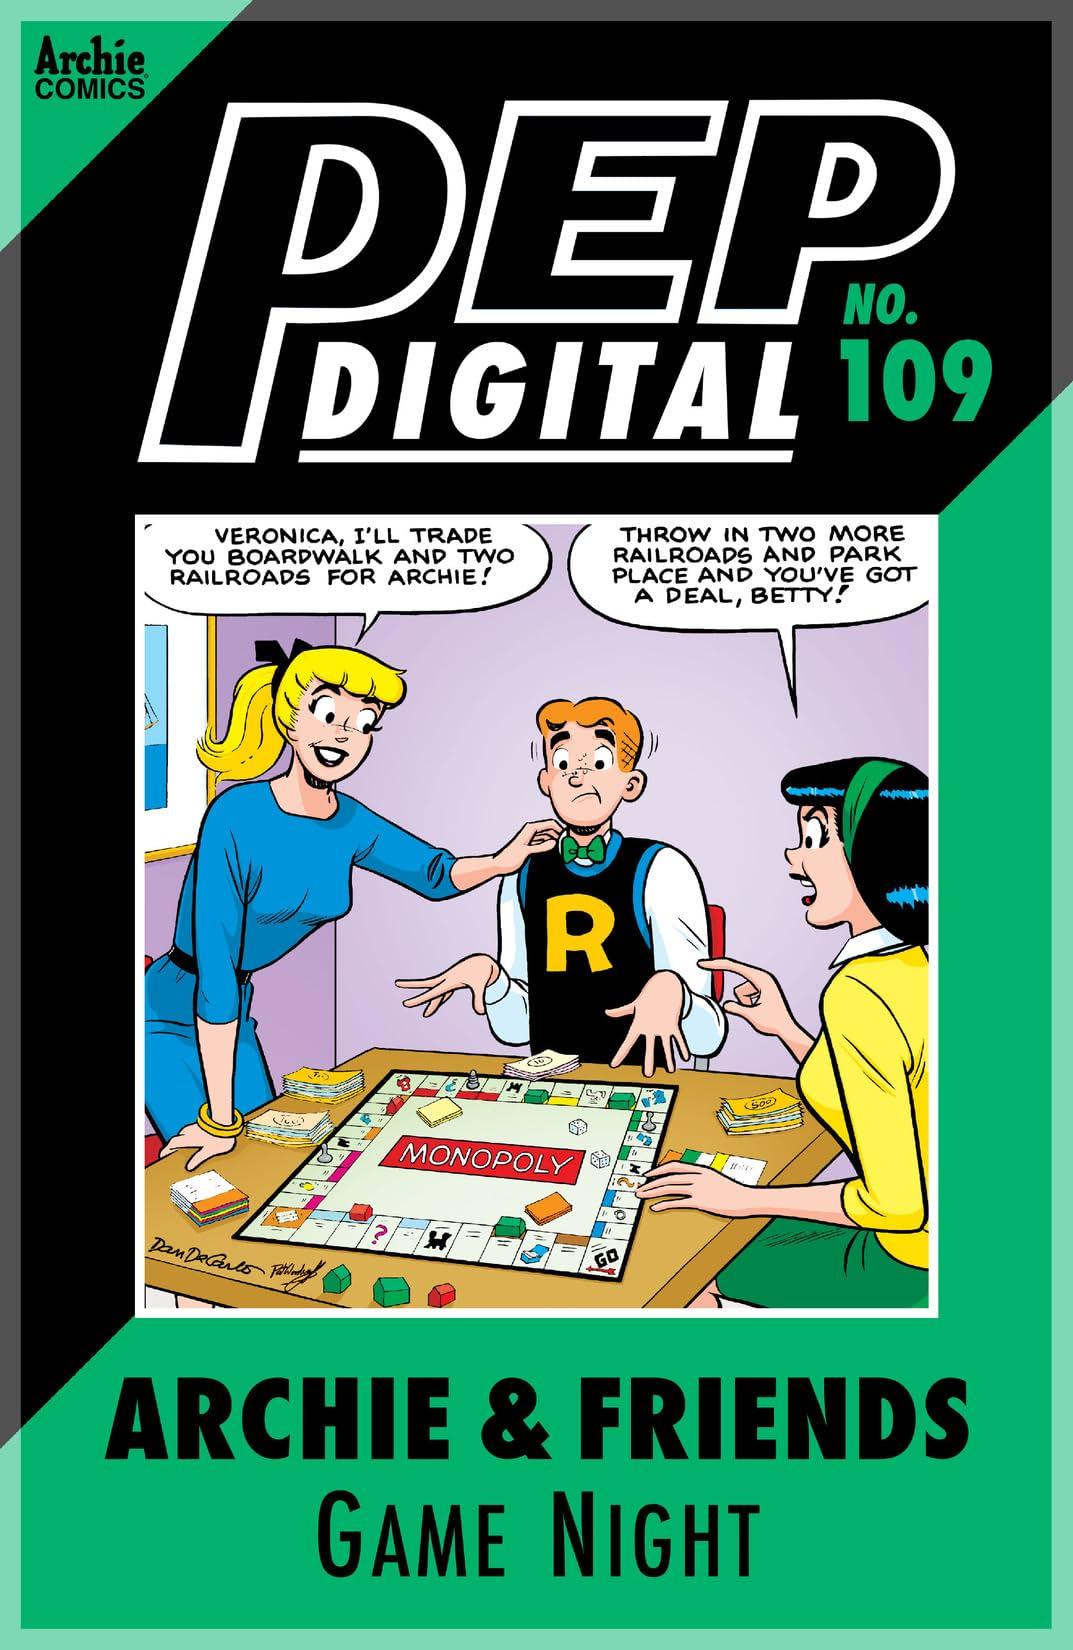 PEP Digital #109: Archie & Friends Game Night